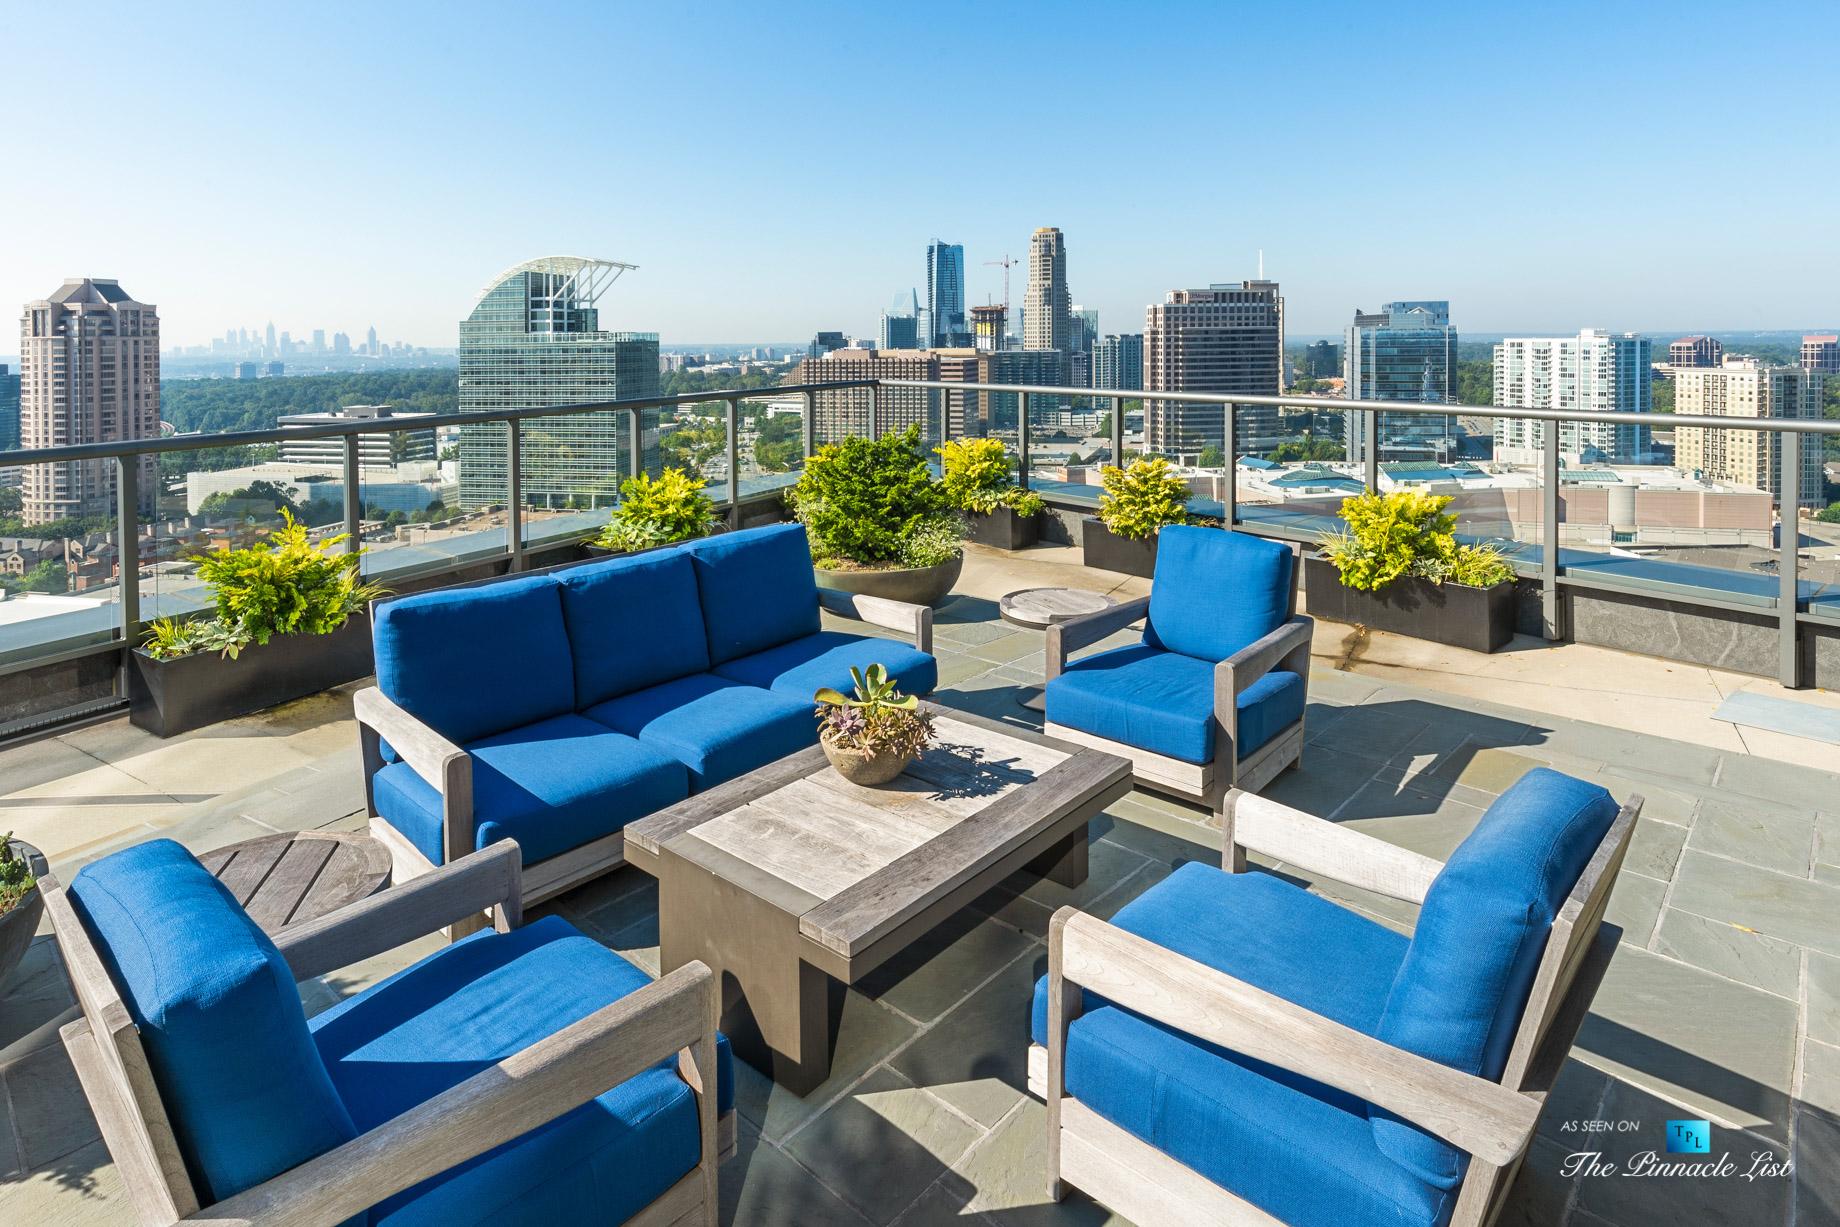 3630 Peachtree Rd NE, Unit 2307, Atlanta, GA, USA - Apartment Exterior Private Lounge Deck - Luxury Real Estate - Ritz-Carlton Residences Buckhead